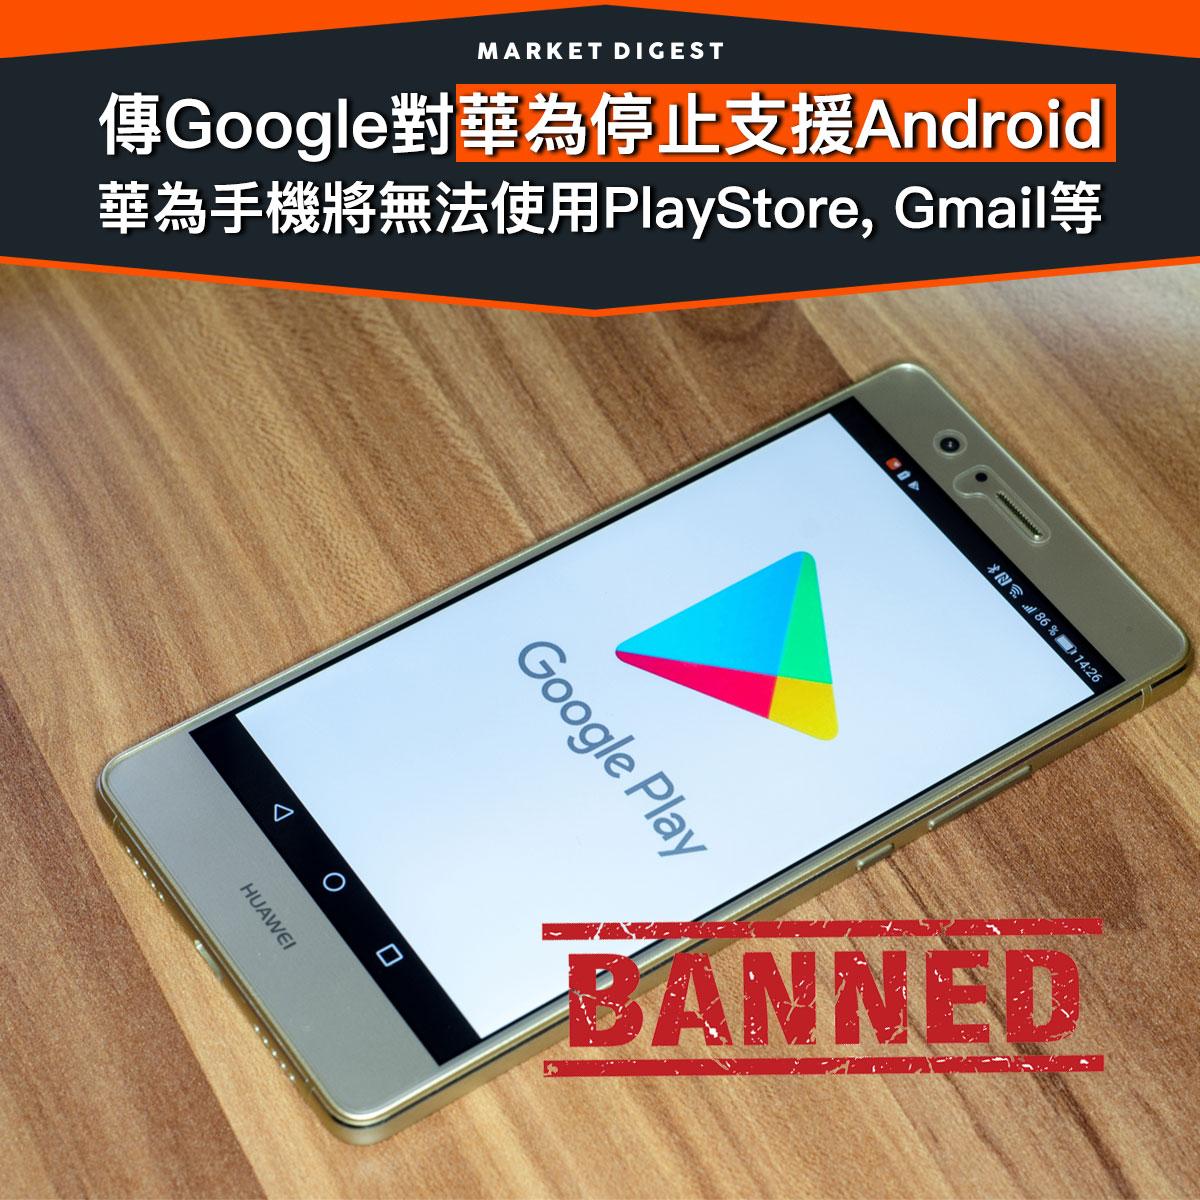 傳Google對華為停止支援Android  華為手機將無法使用PlayStore, Gmail等